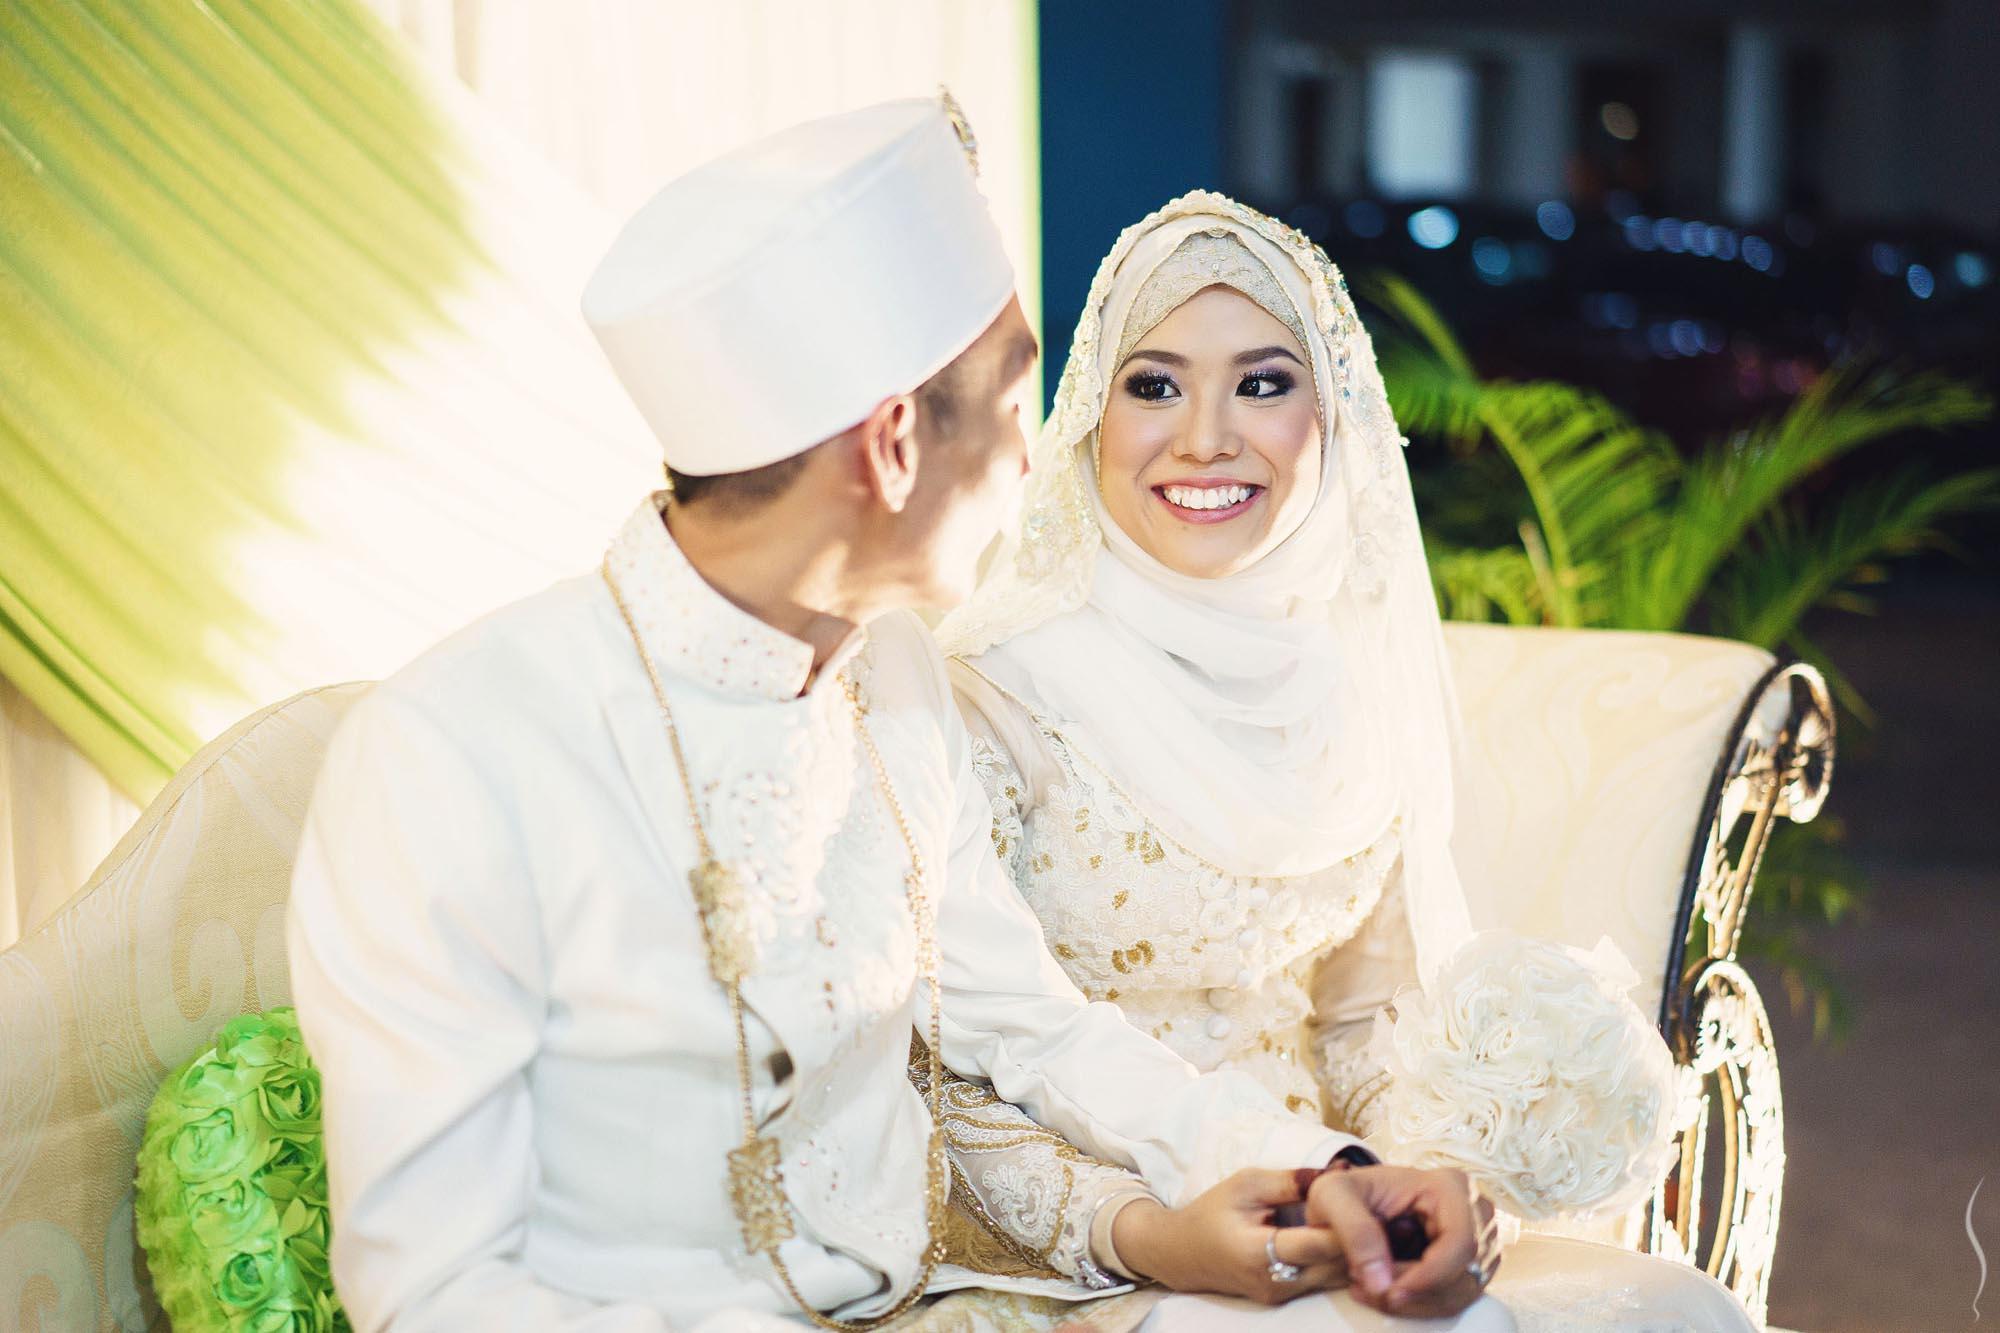 Malay-Chinese Wedding at Lagun Sari: Roy & Ema — Simplifai Studios